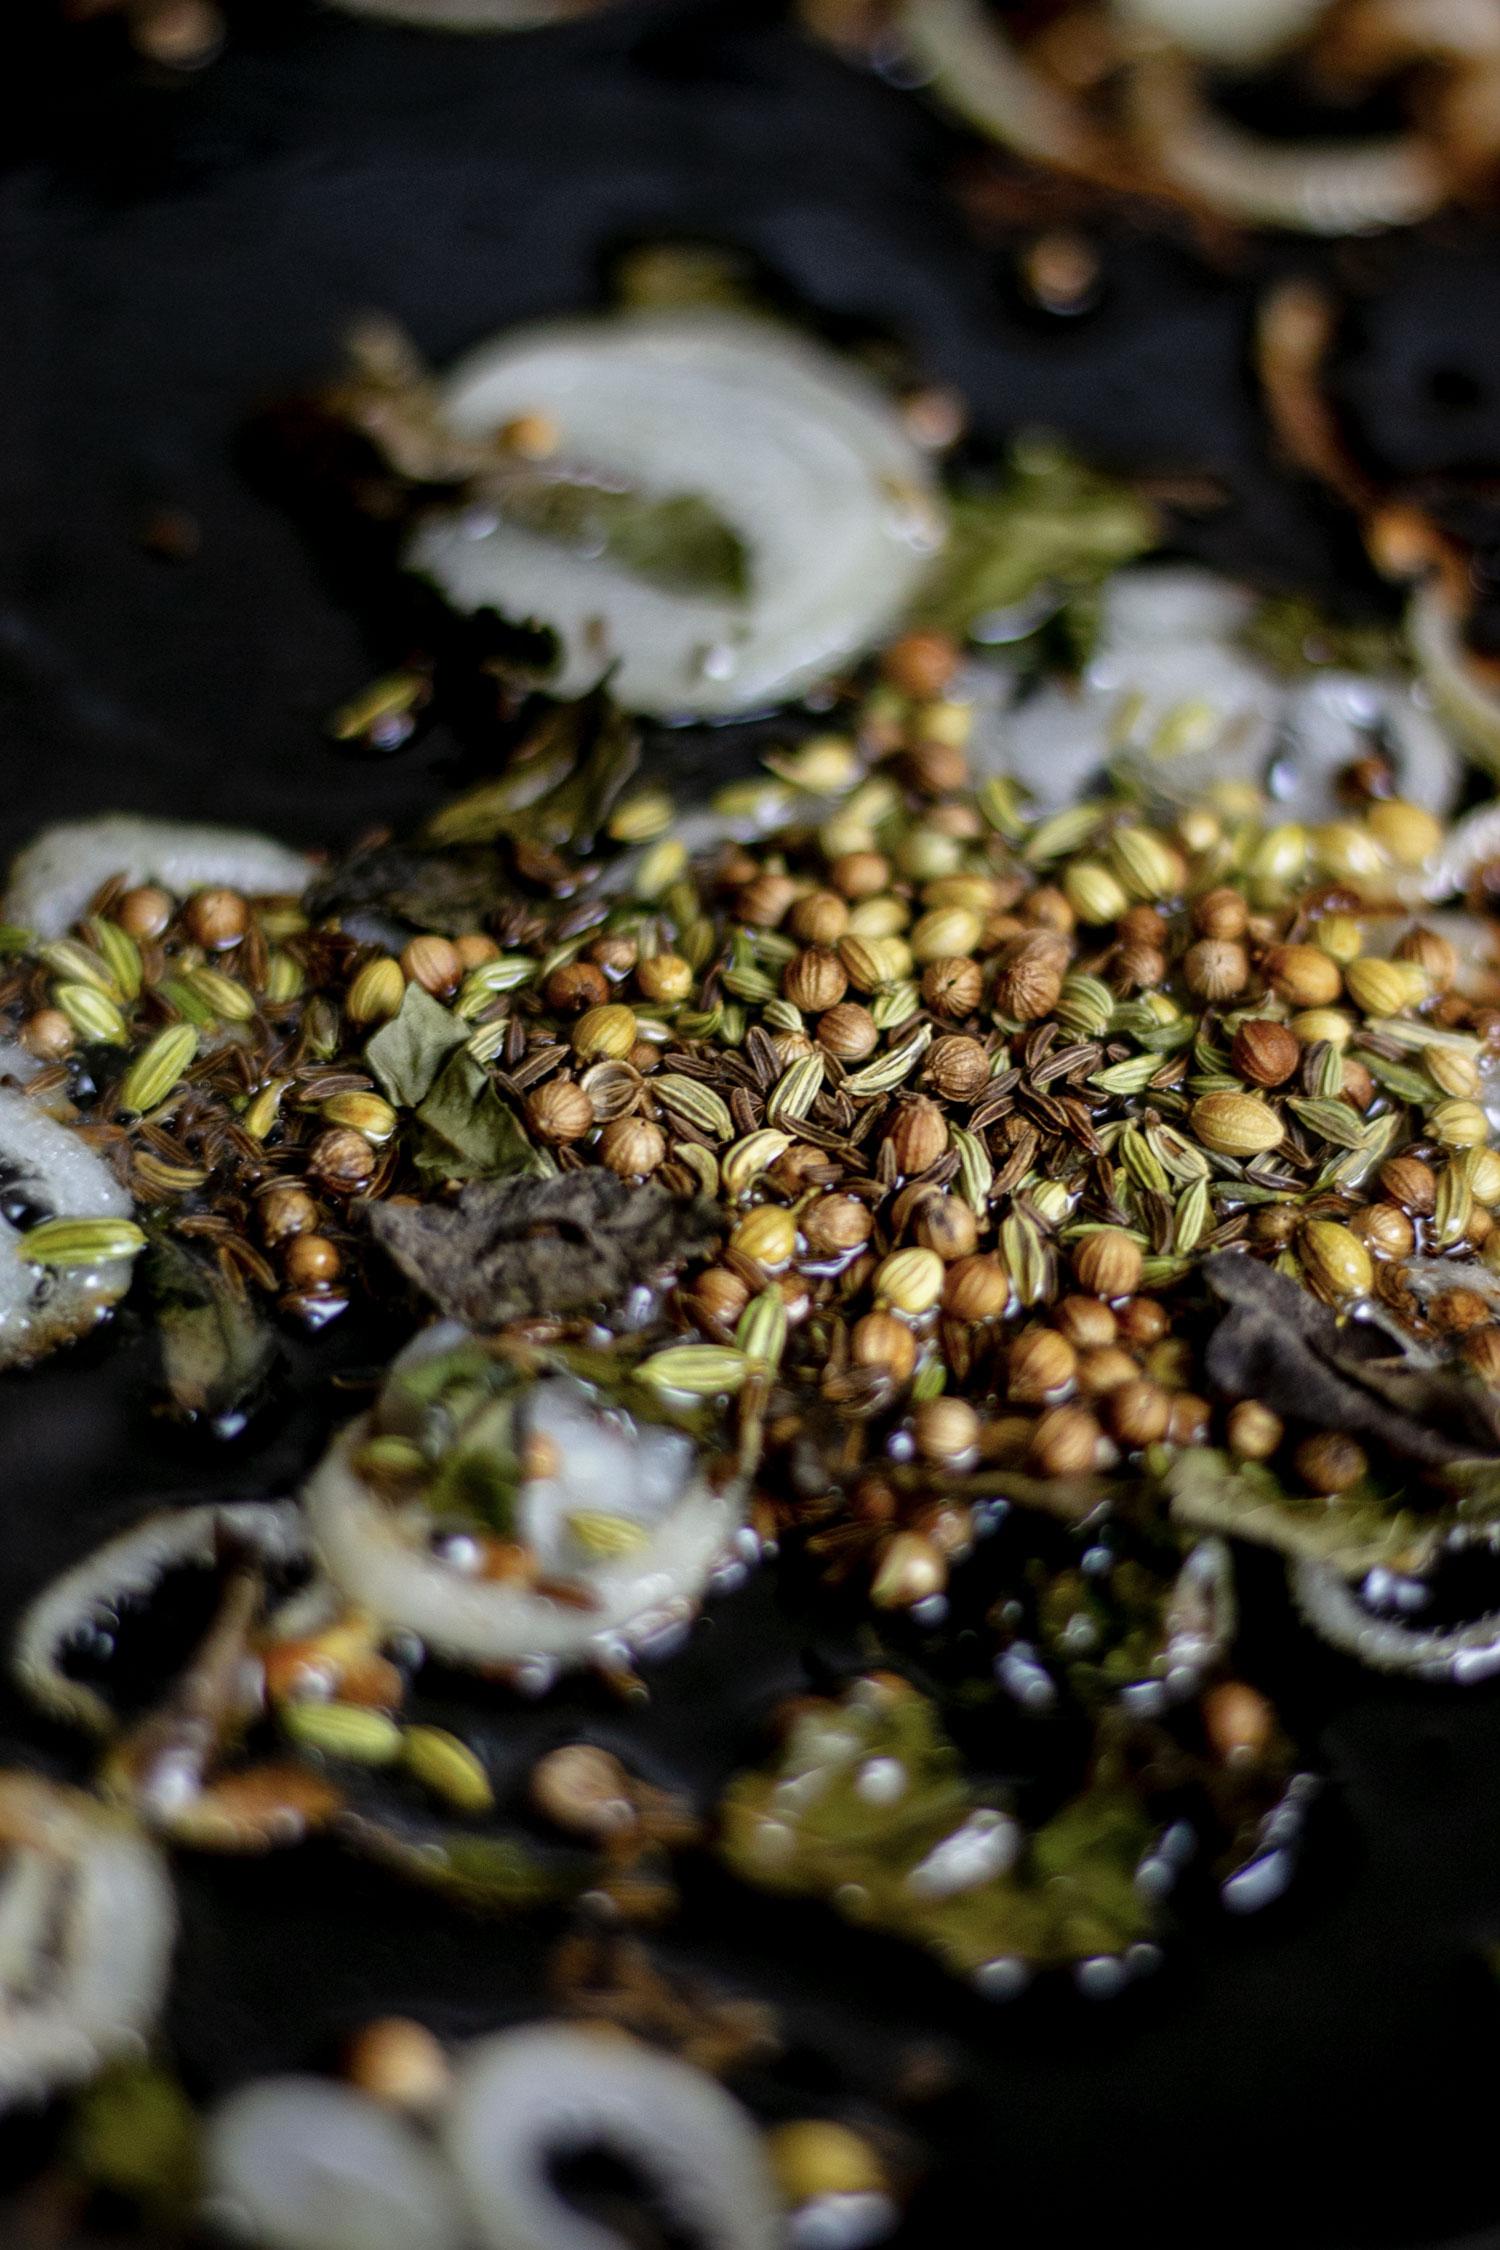 graines de fenouil, coriandre, cumin biologiques en train de rissoler